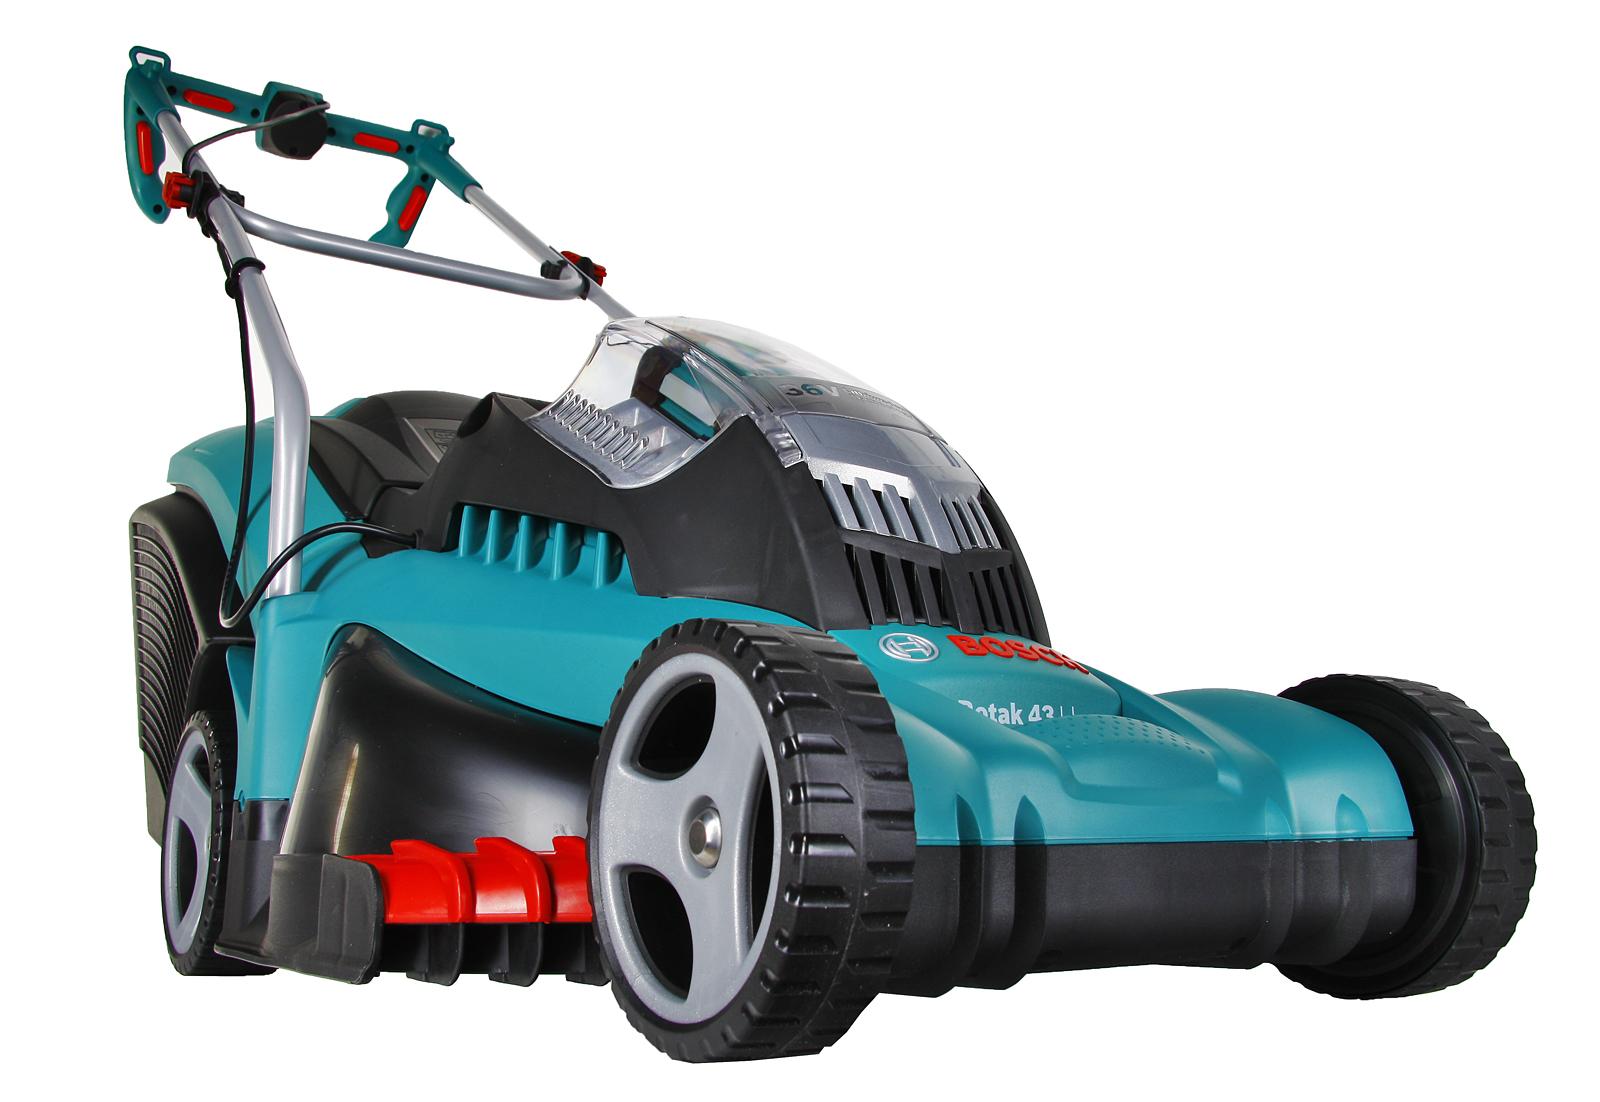 Аккумуляторная газонокосилка Bosch Rotak 43 li (0.600.8a4.507) bosch rotak 43 li 06008a4507